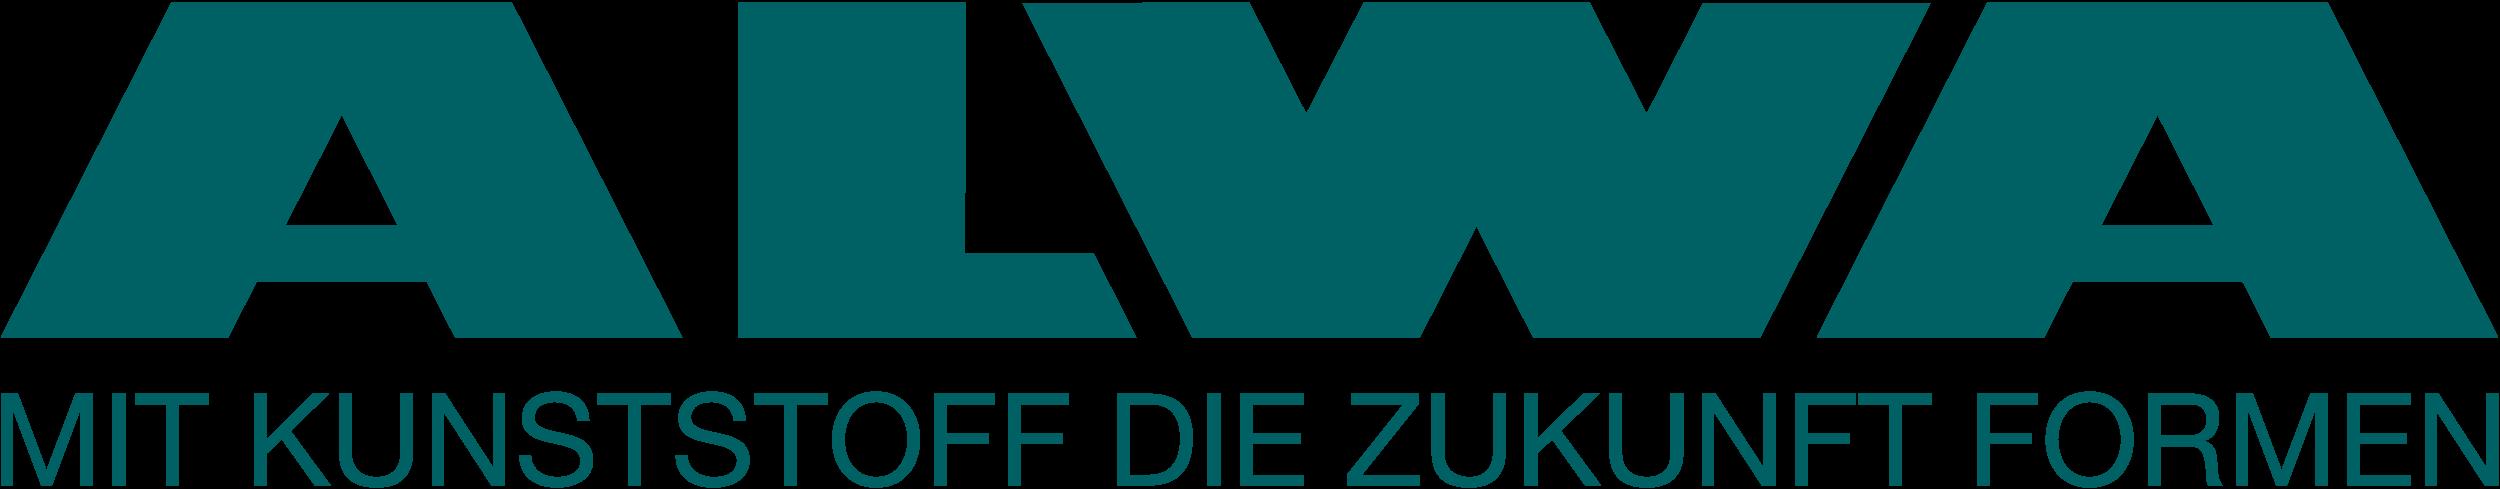 Alwa_Logo